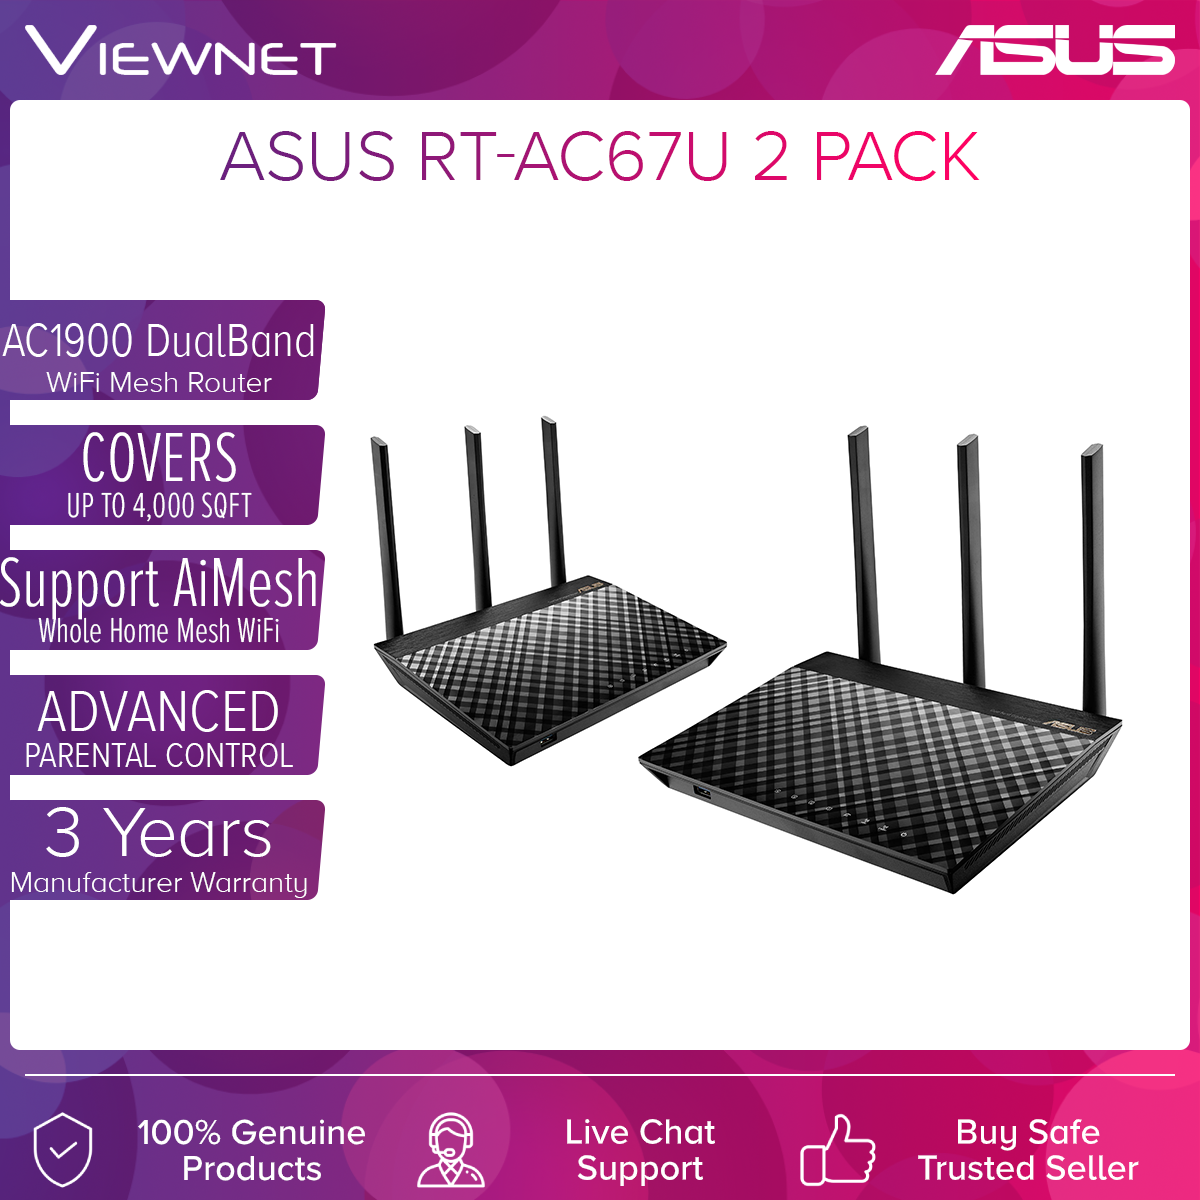 Asus RT-AC67U AC1900 AiMesh Gigabit Router (2 Pack)